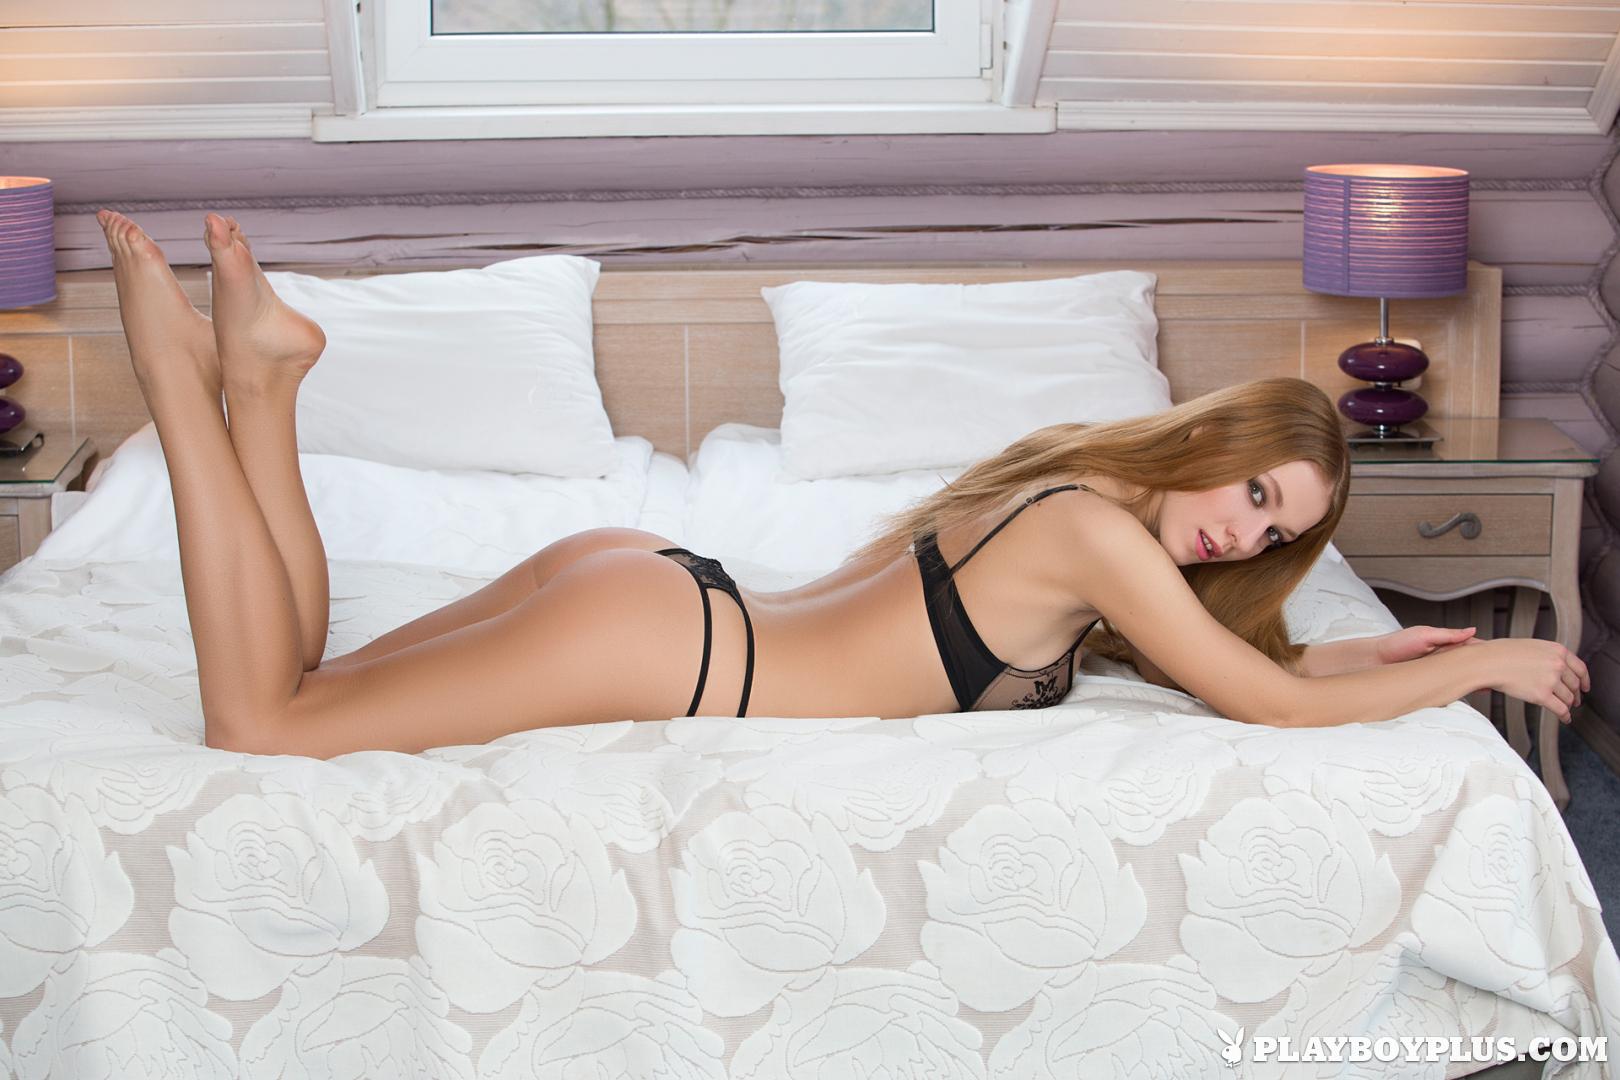 Playboy Cybergirl - Nicky Hendrix Nude Photos & Videos at Playboy Plus!